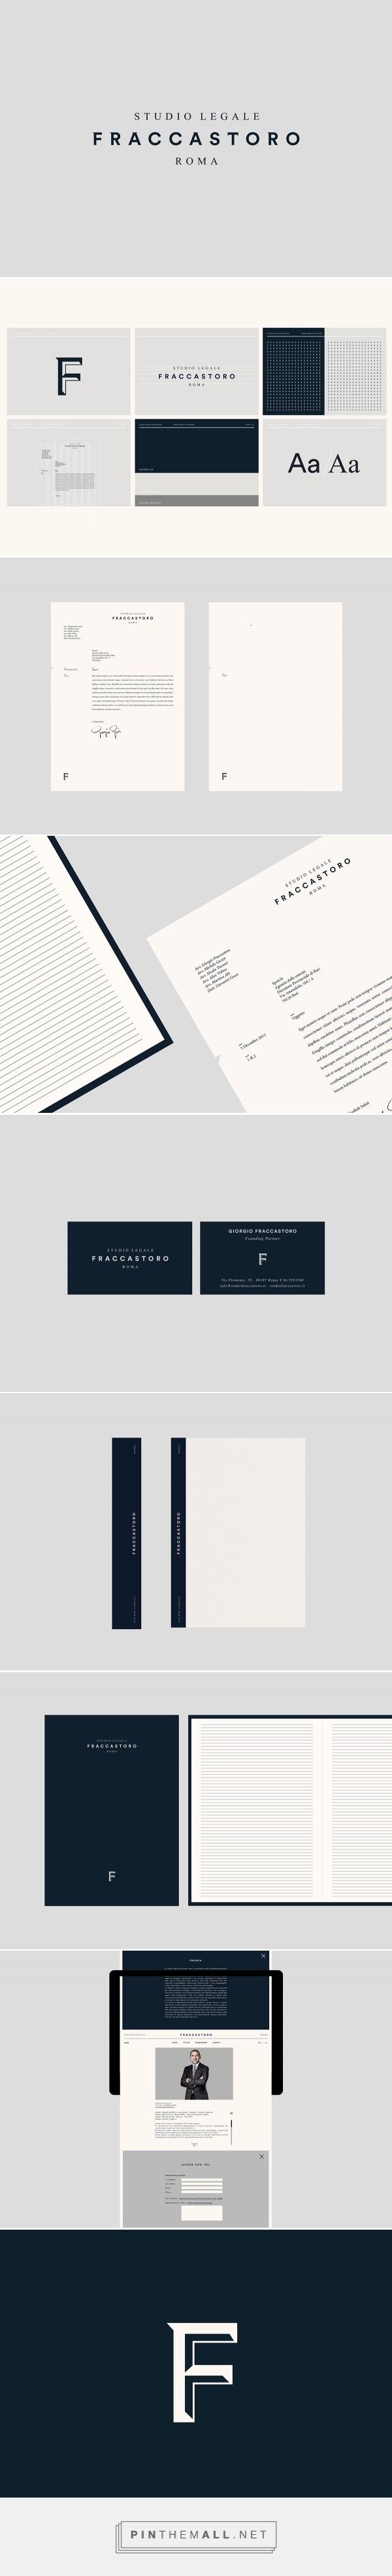 logo, identity, design